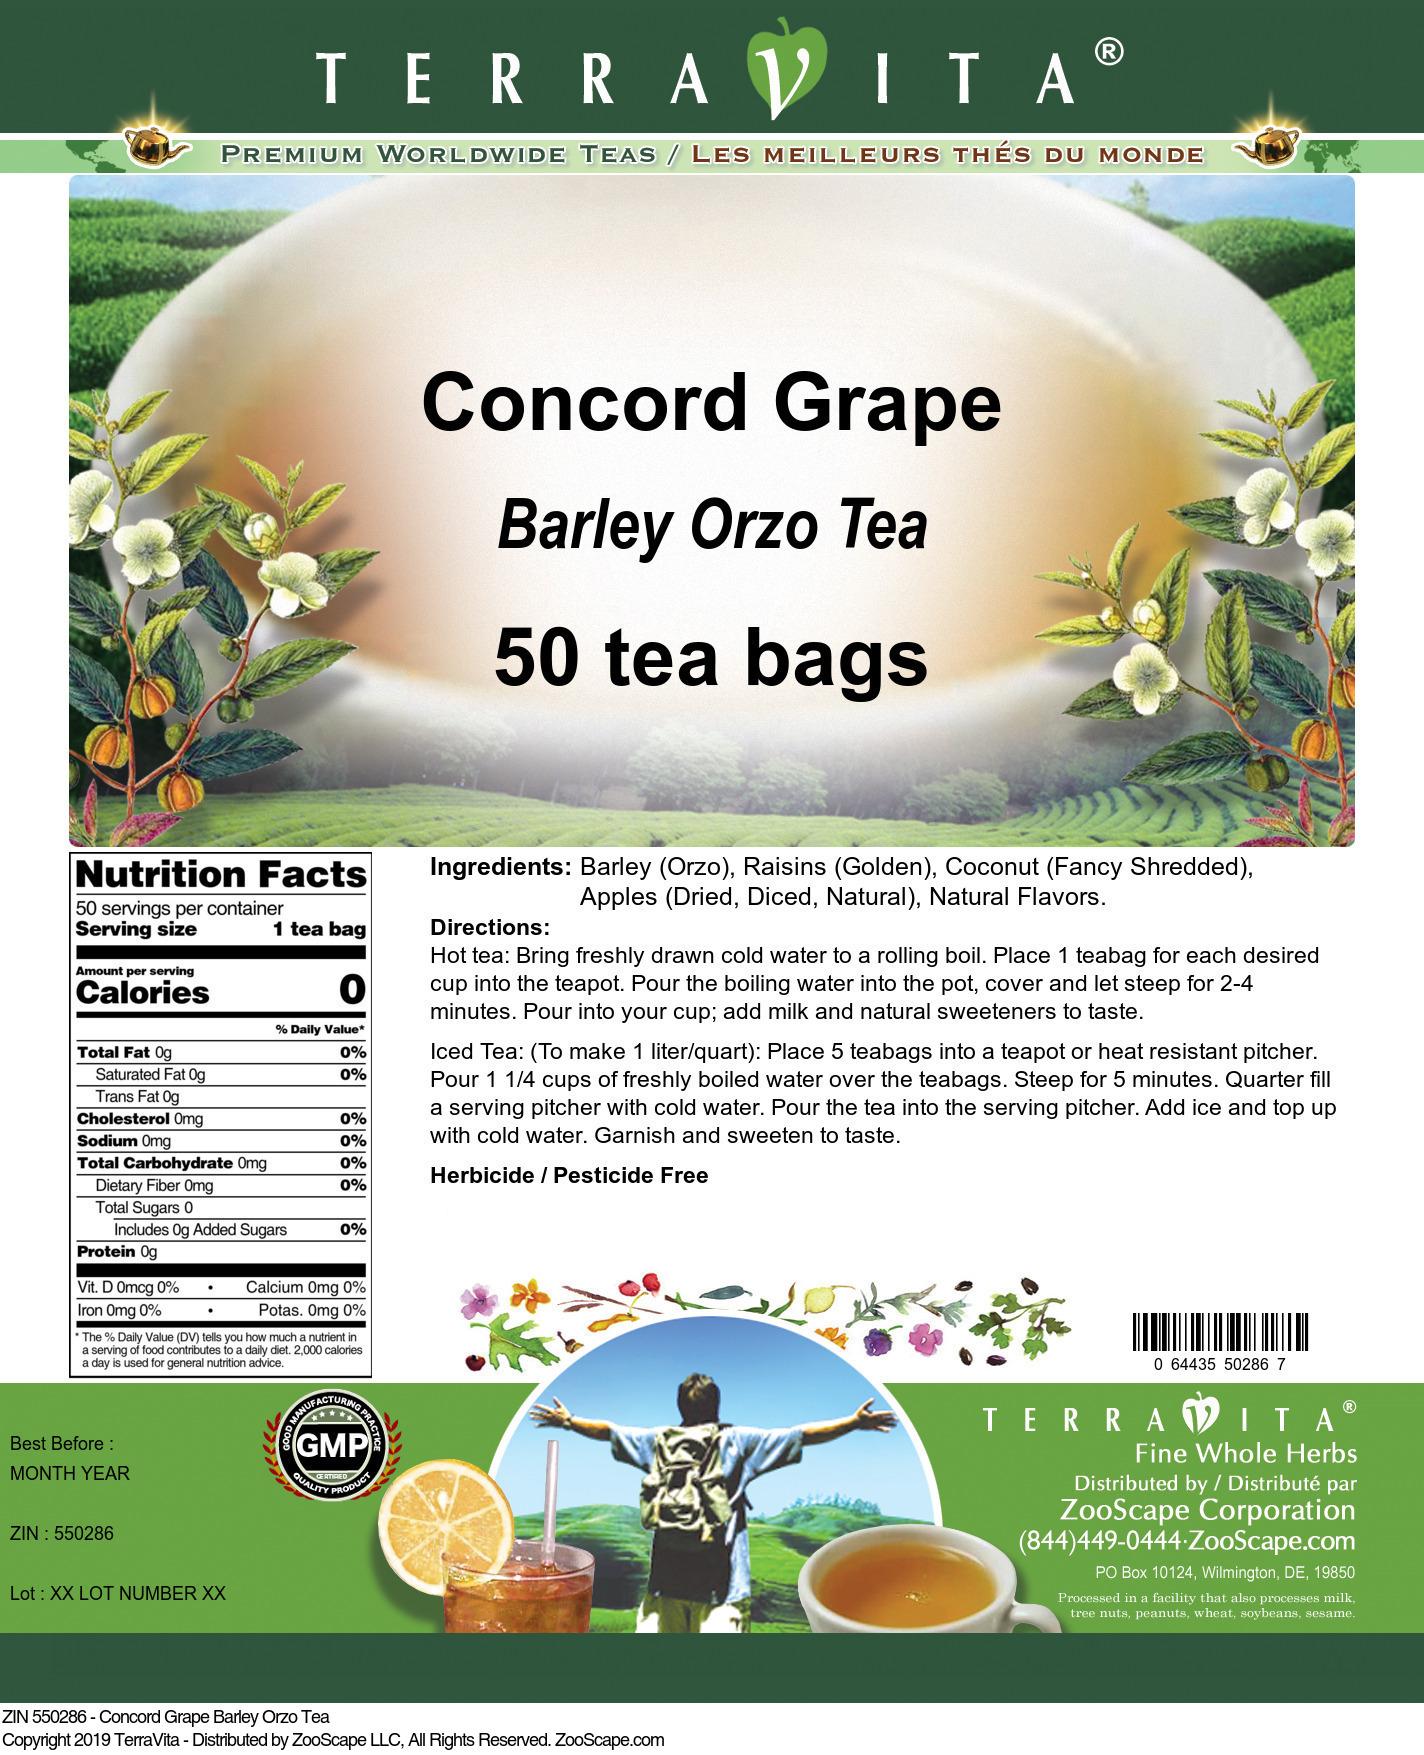 Concord Grape Barley Orzo Tea